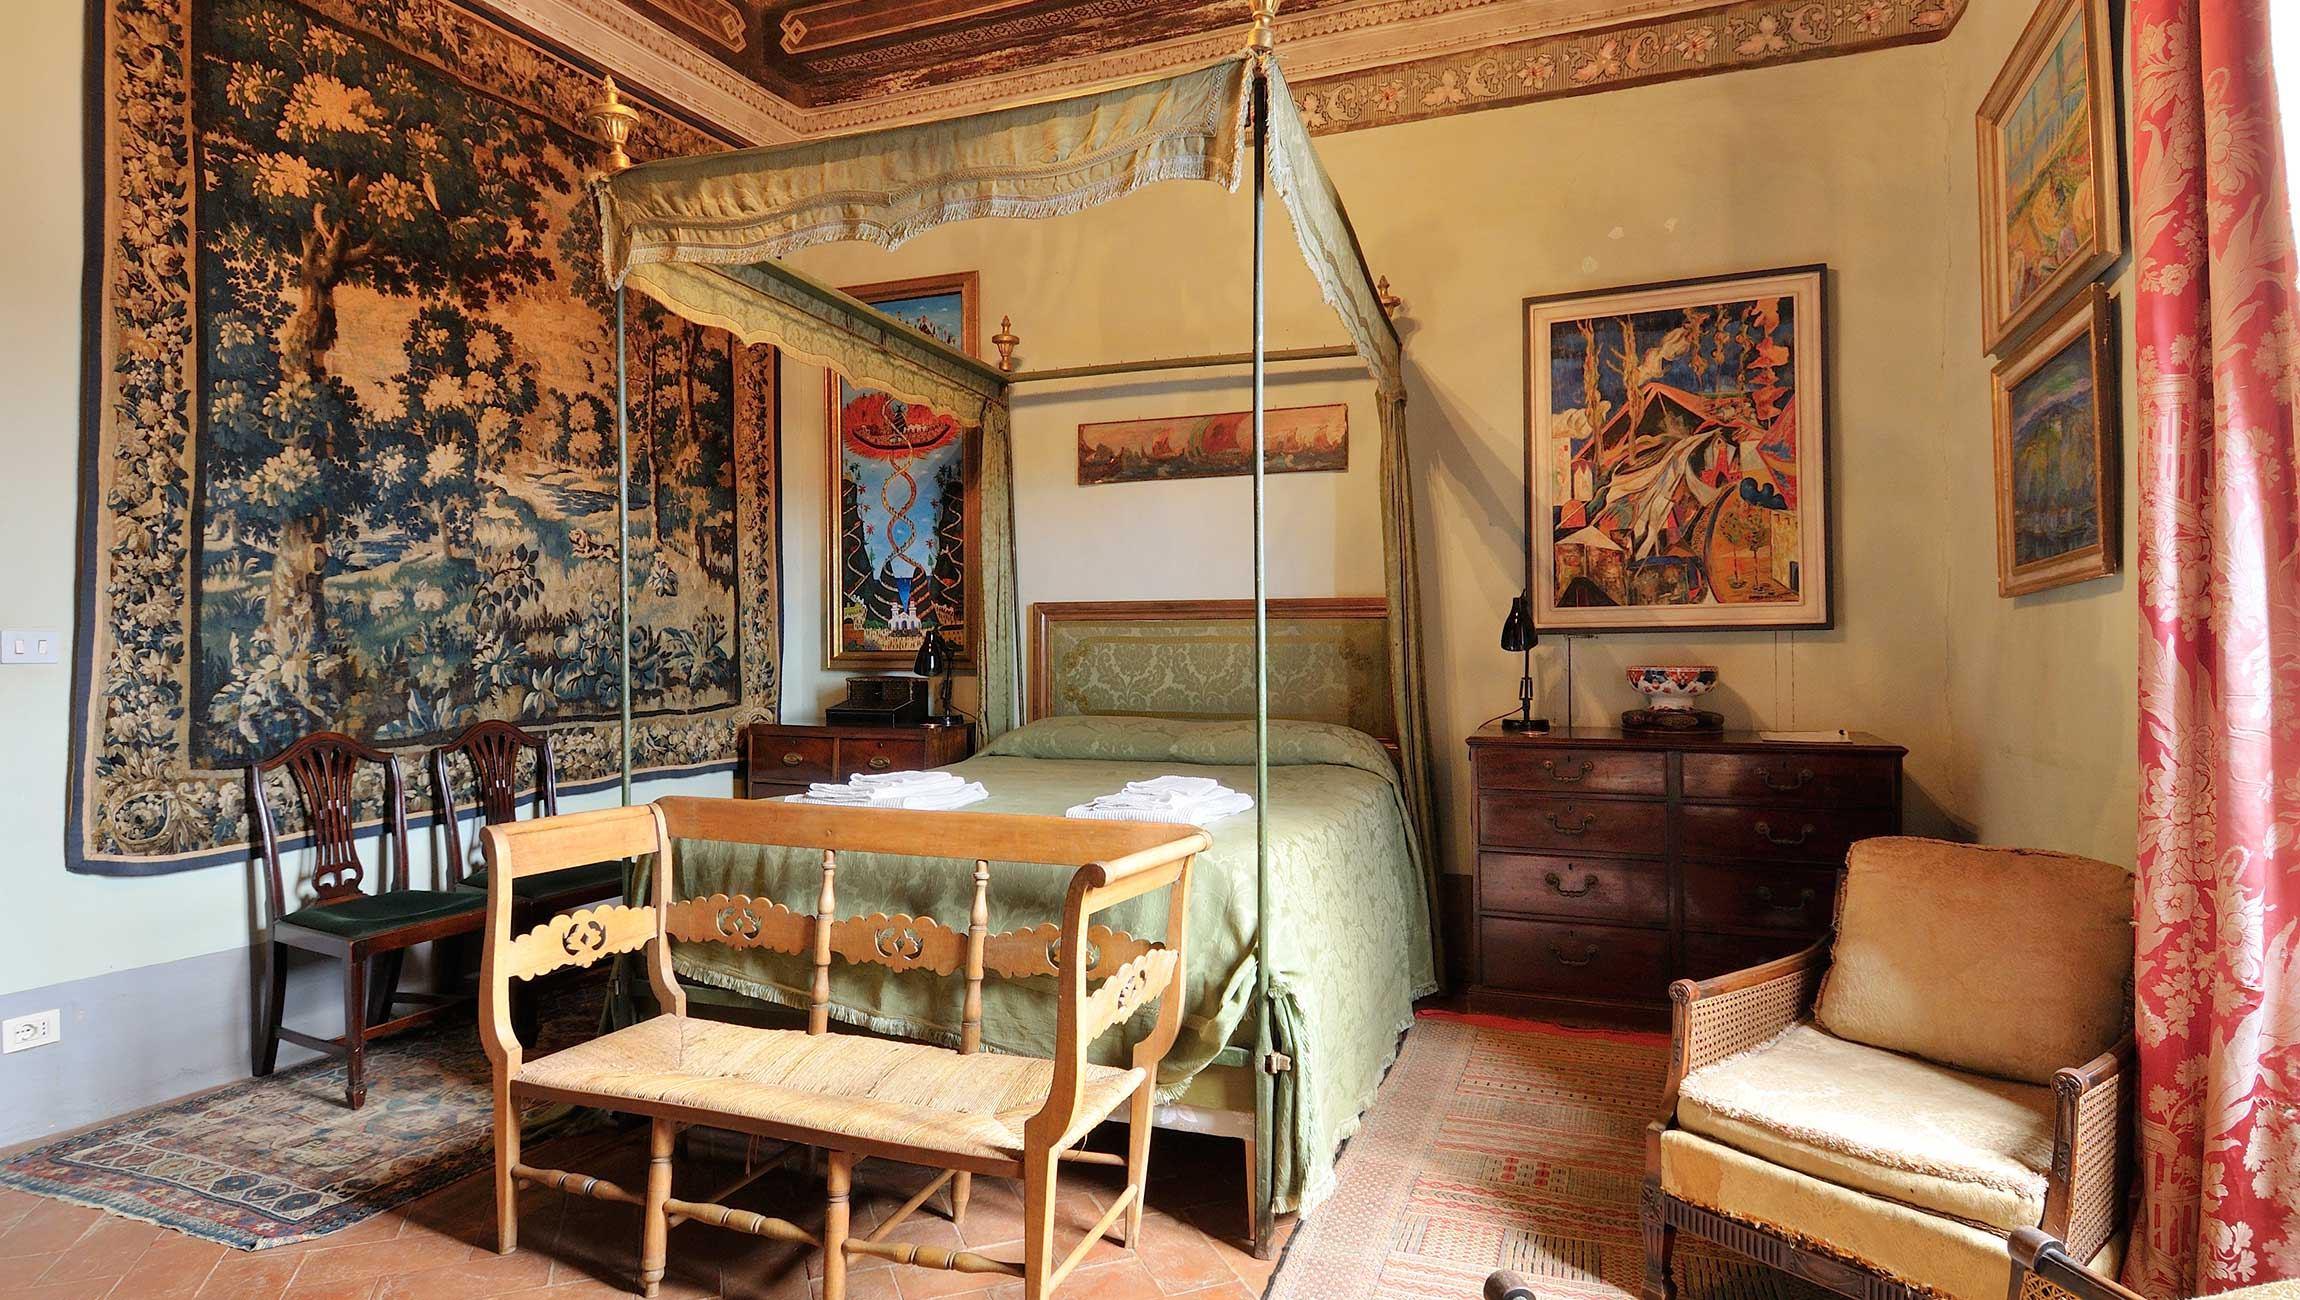 The Baron's Room